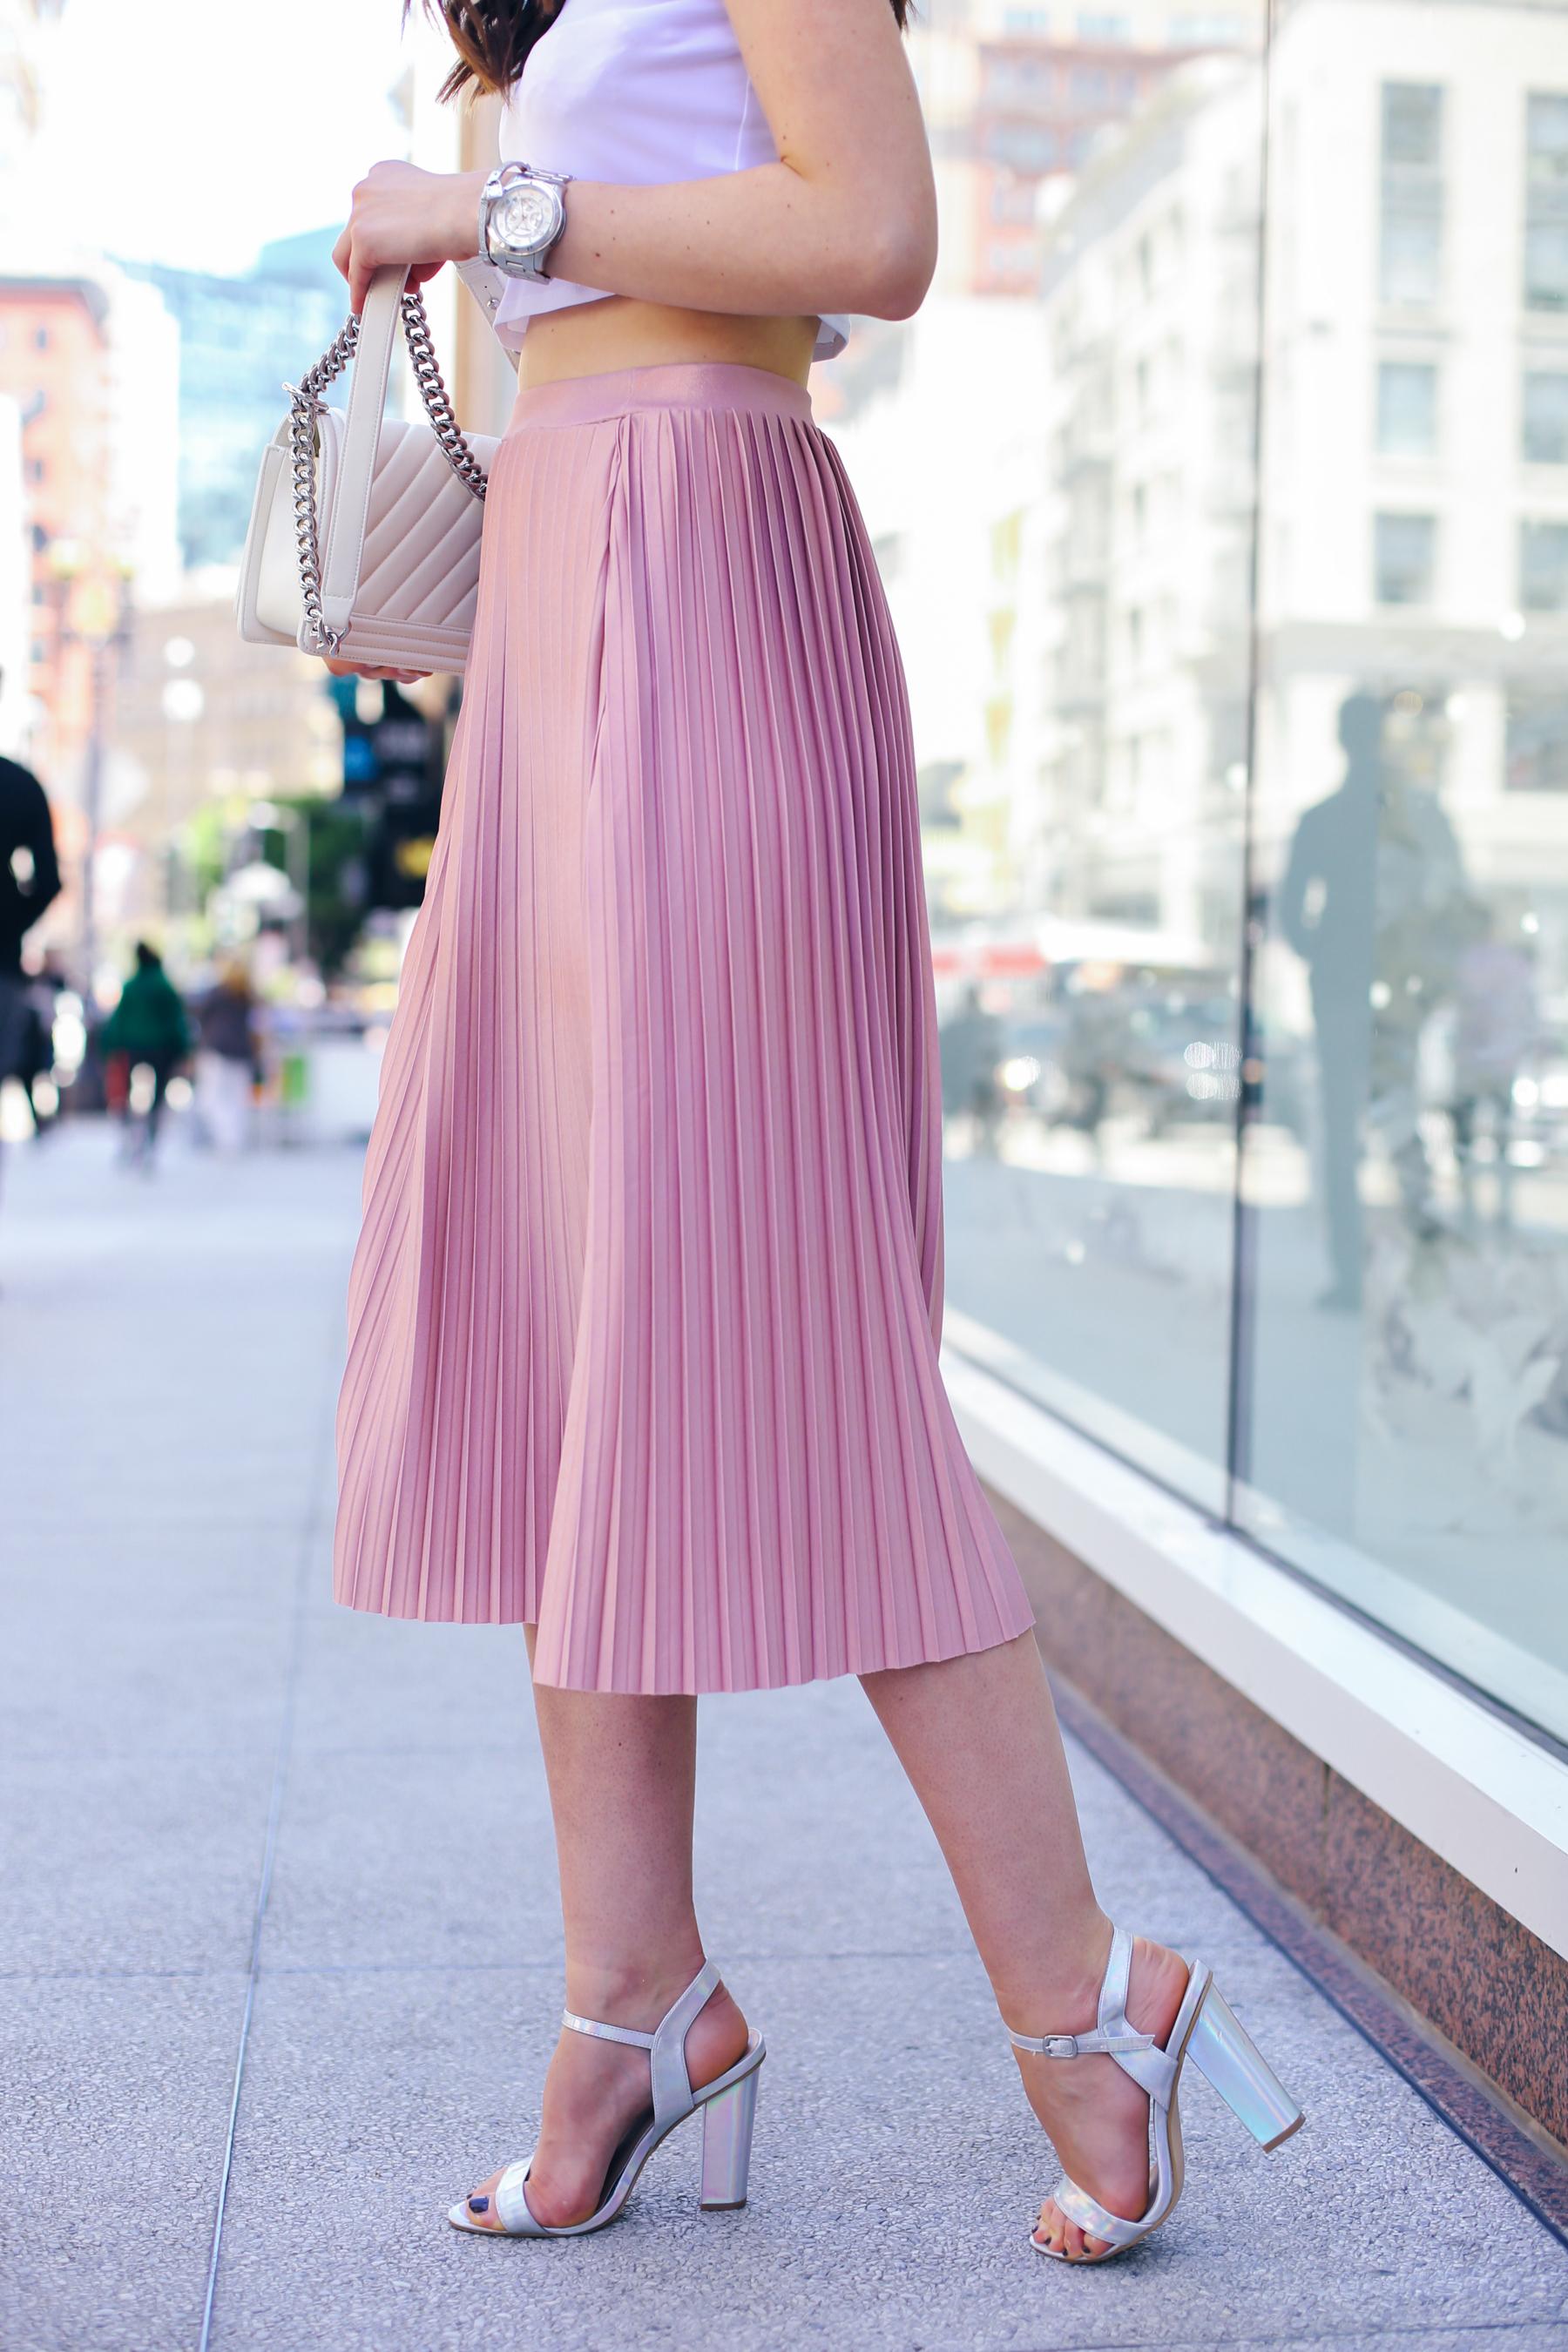 Barbora-Ondracova-FashioninmySoul-Fashion-Blogger-Photography-RyanbyRyanChua-7877